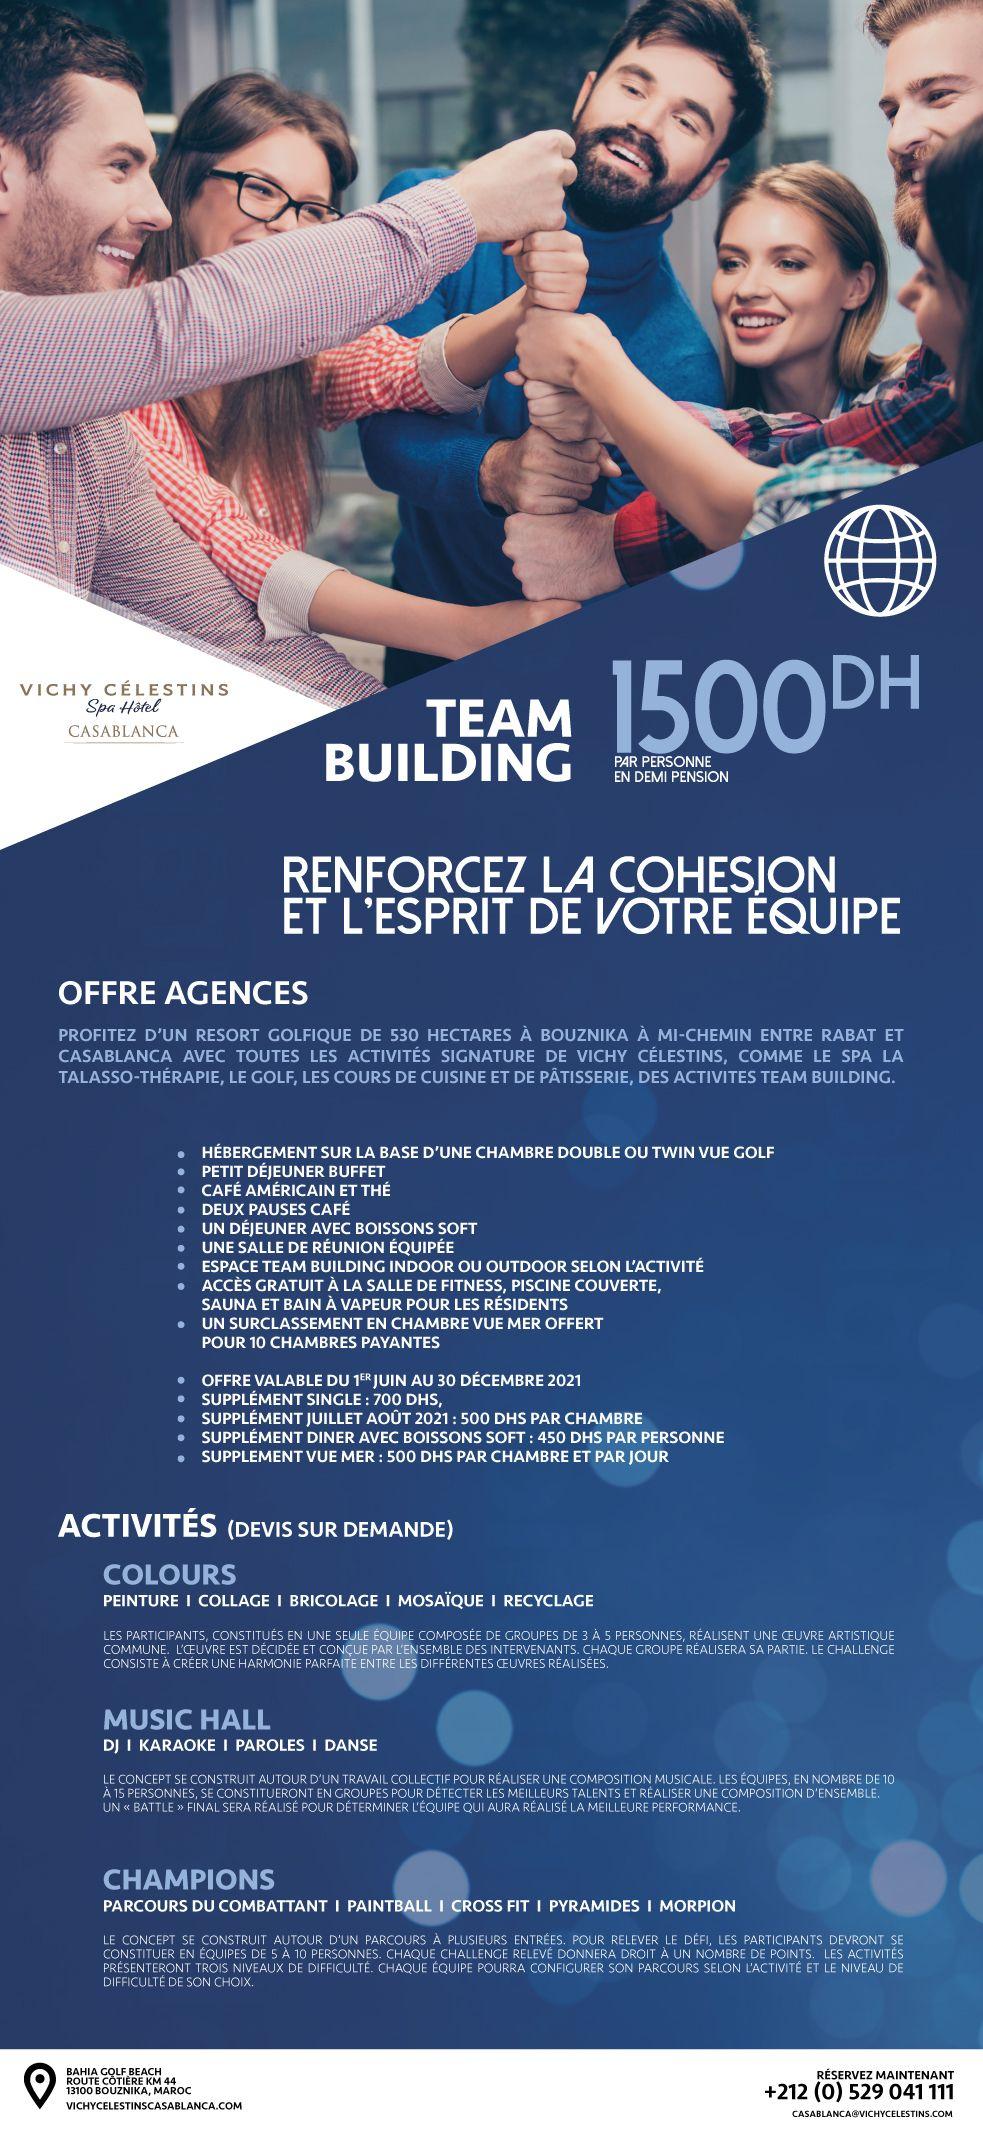 Vichy célestins – Team-Building